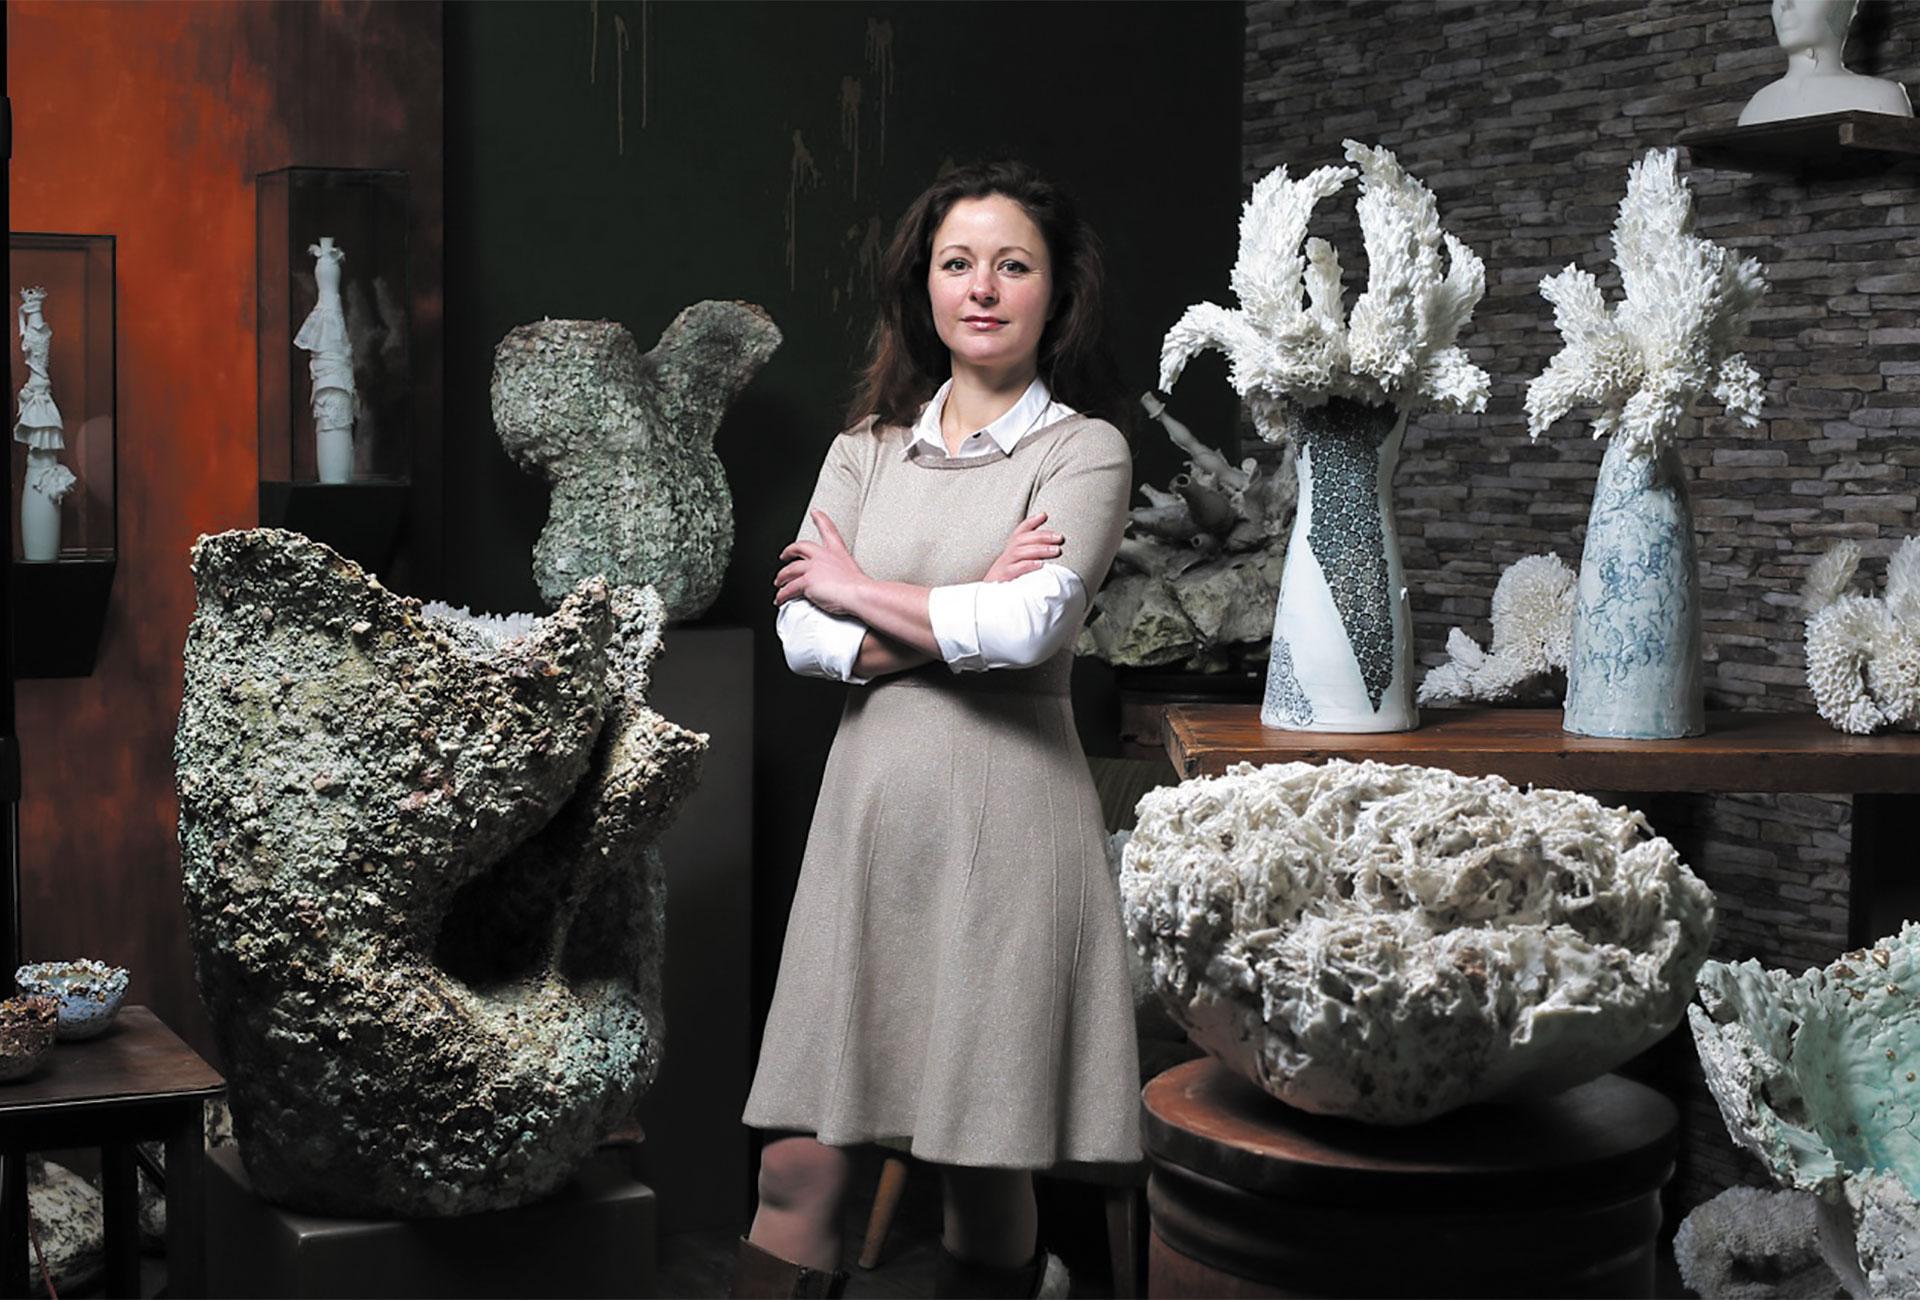 eunique karlsruhe 2015 teil iii art aurea. Black Bedroom Furniture Sets. Home Design Ideas